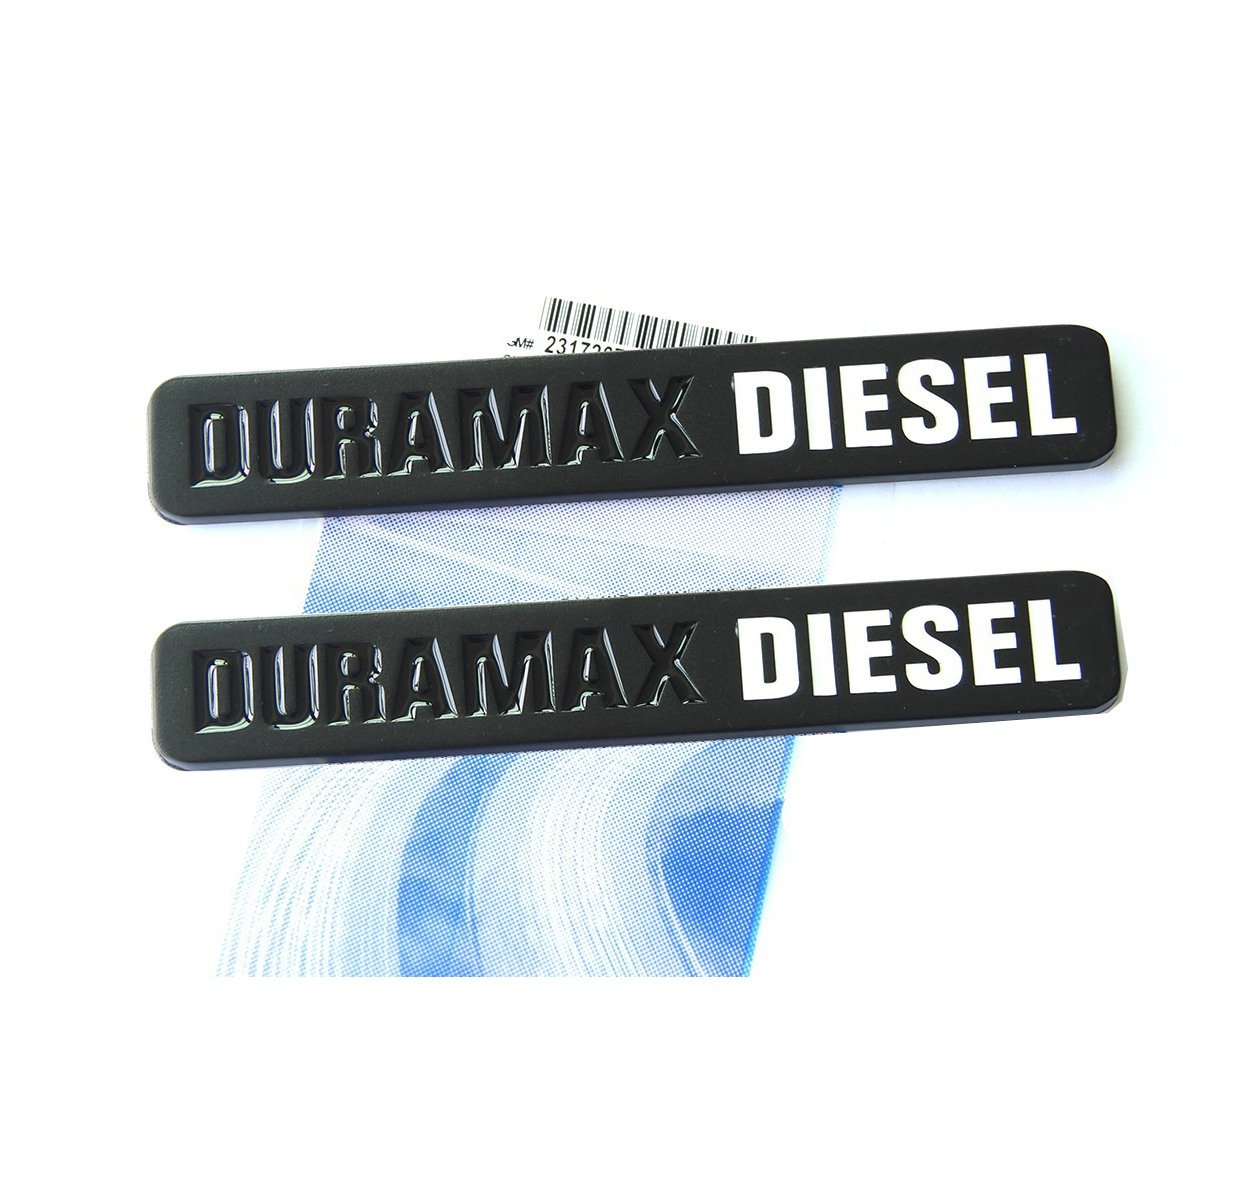 Yoaoo® 2x OEM Black Duramax Diesel Allison Truck Emblem Badges SILVERADO 2500 3500 HD GMC SIERRA Matte Black White